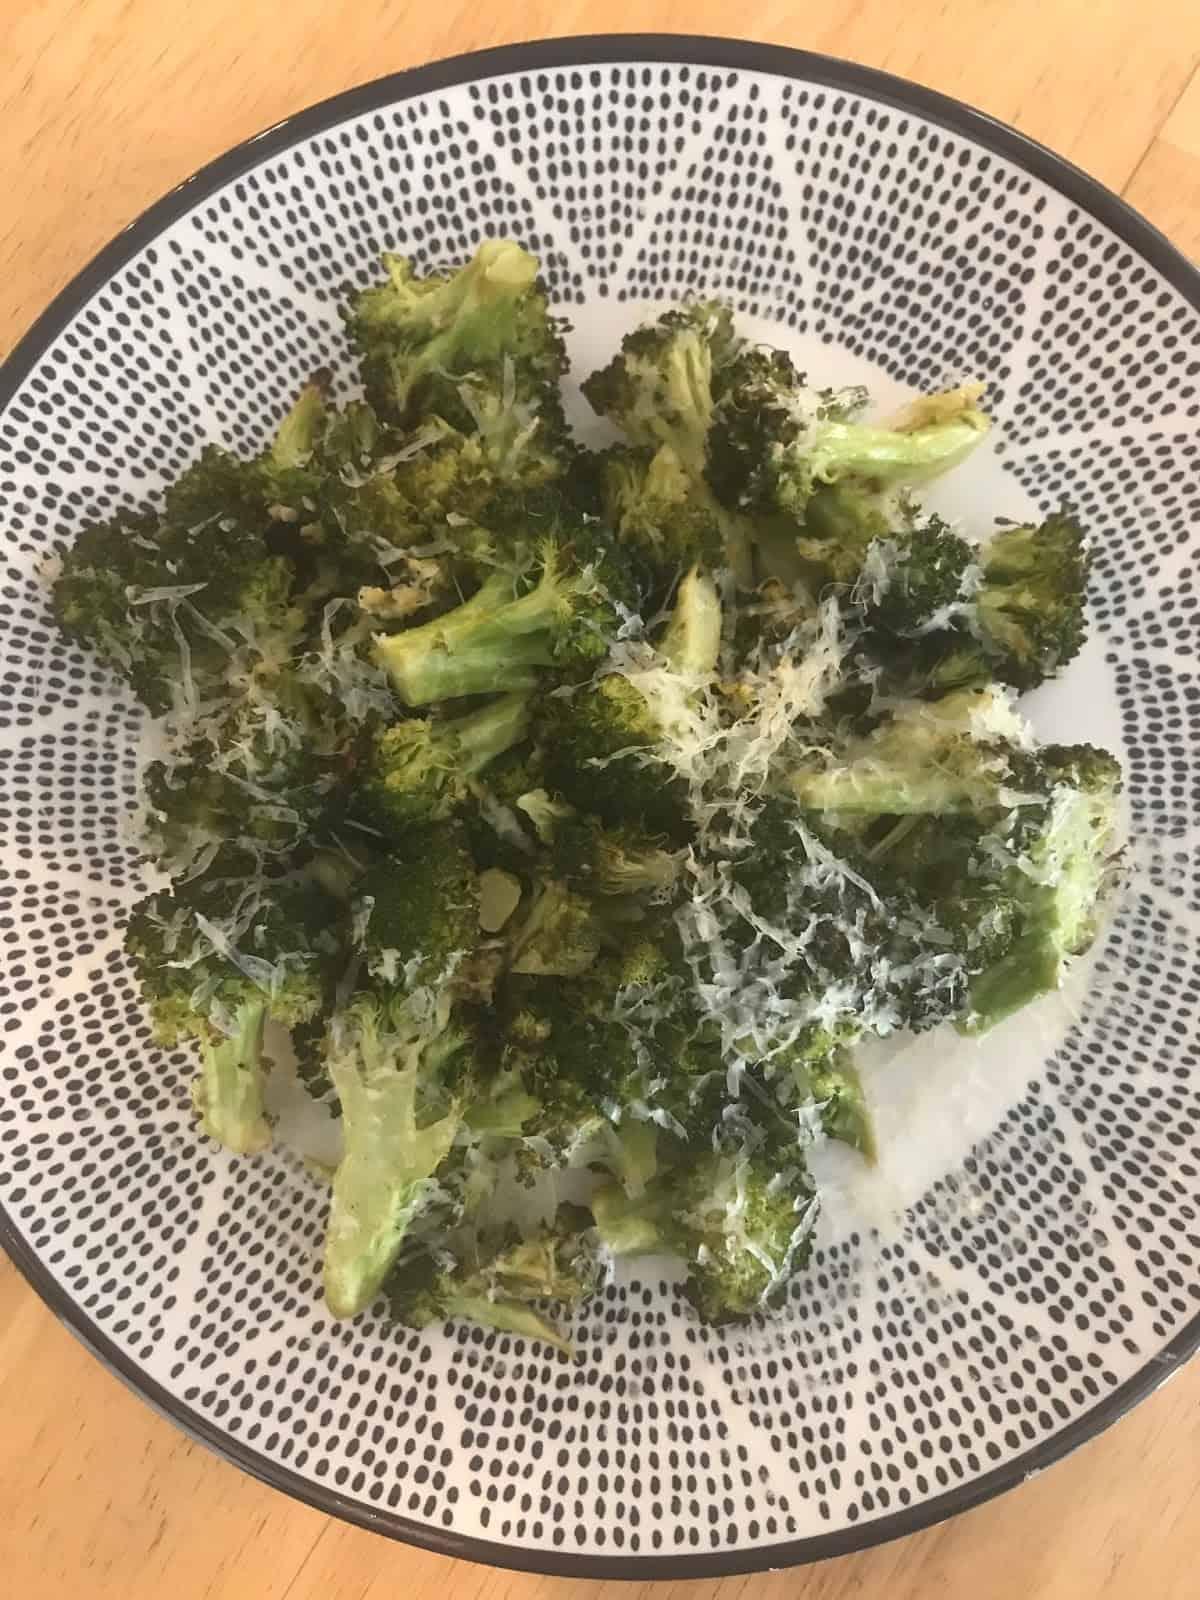 Lemon-Parmesan Roasted Broccoli + A Trip to the Pool